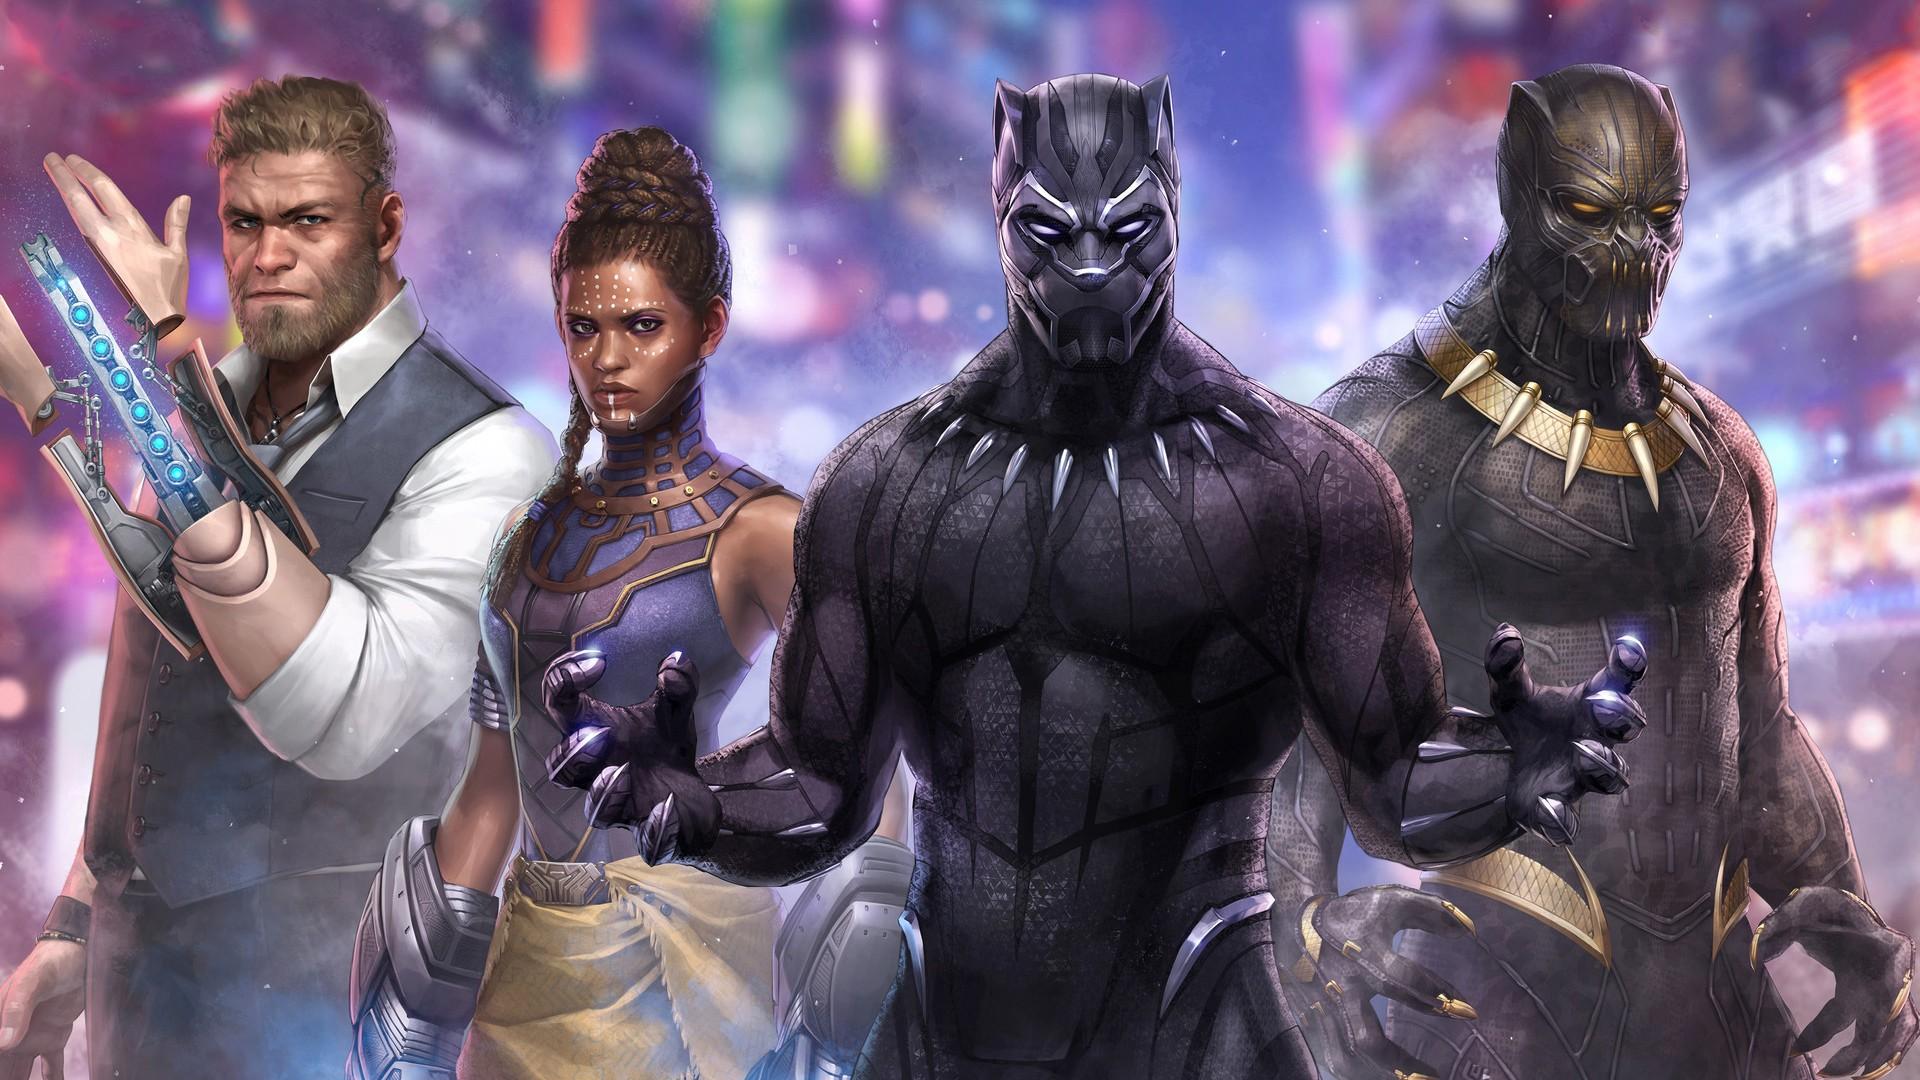 Hulk 3d Wallpaper Download Black Panther Marvel Future Fight Artwork Wallpapers Hd